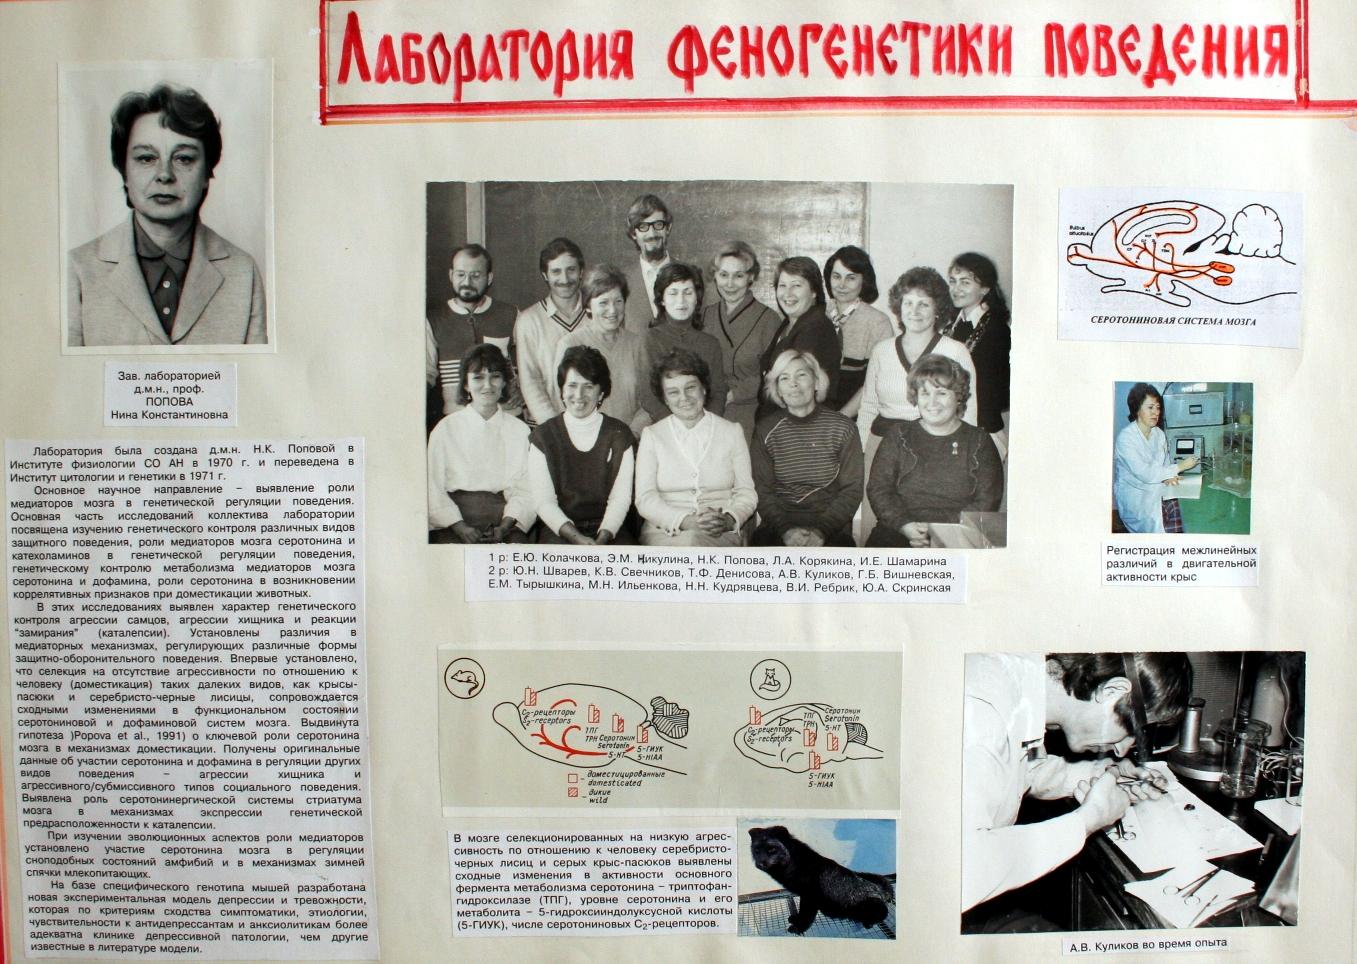 Фотоальбом к 40-летию ИЦиГ СО РАН